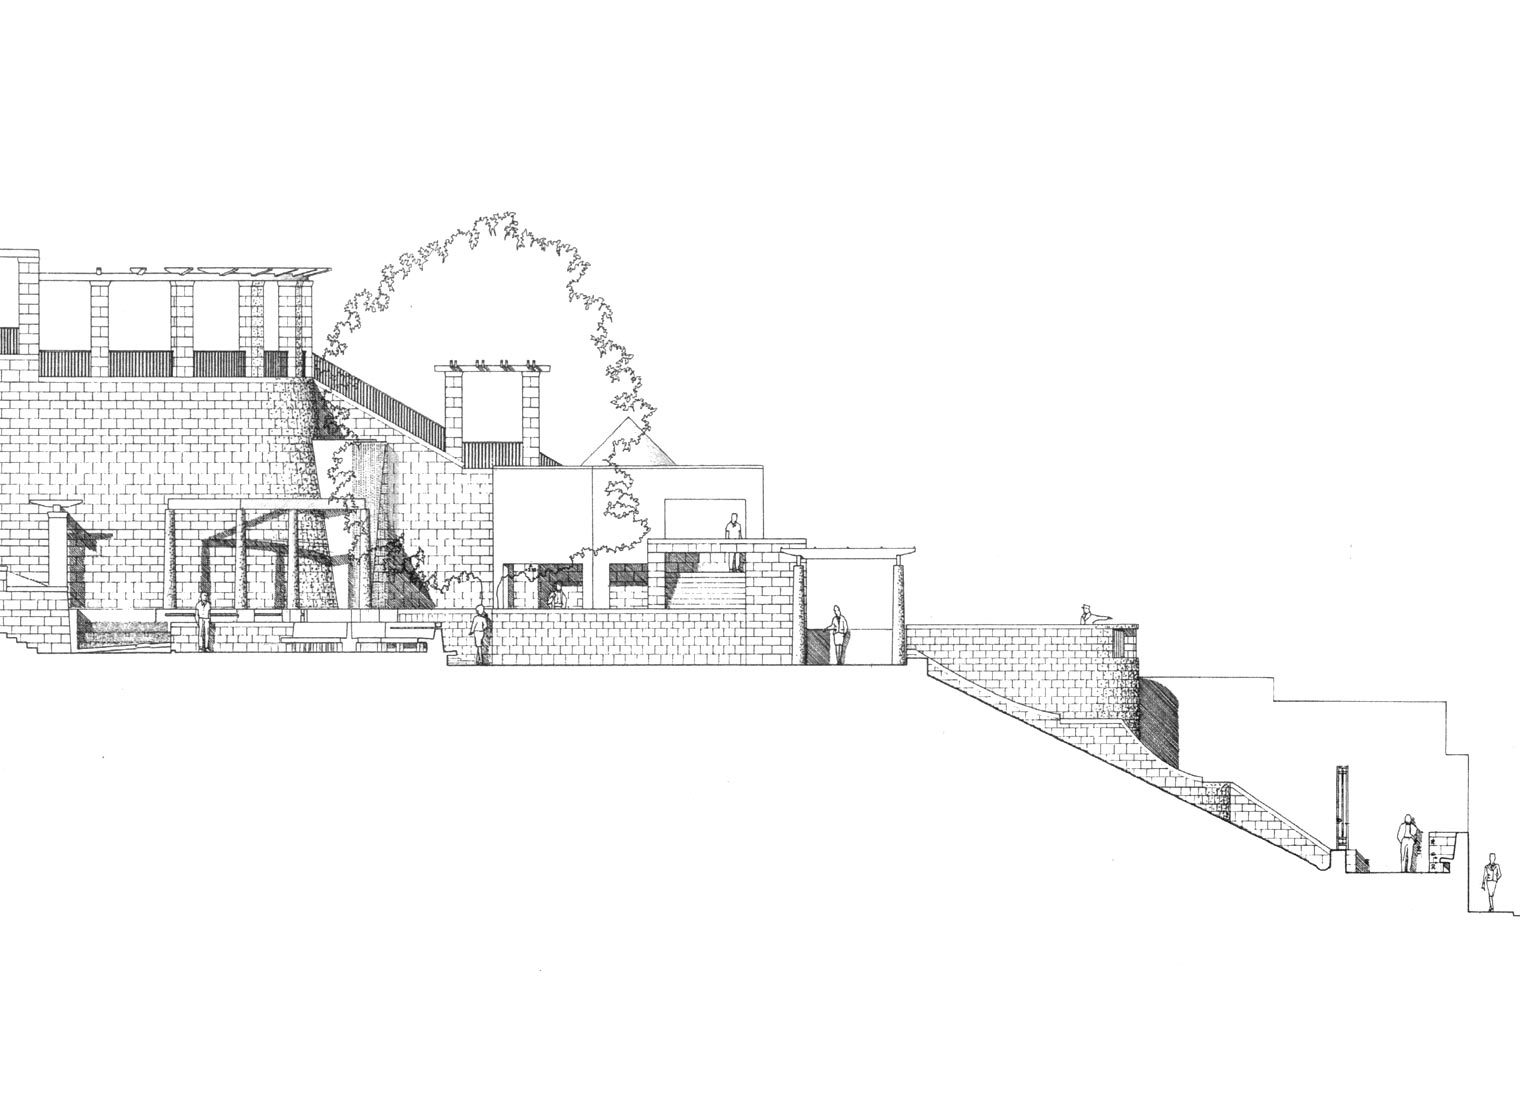 vk-architetti_sanmichele_sez4